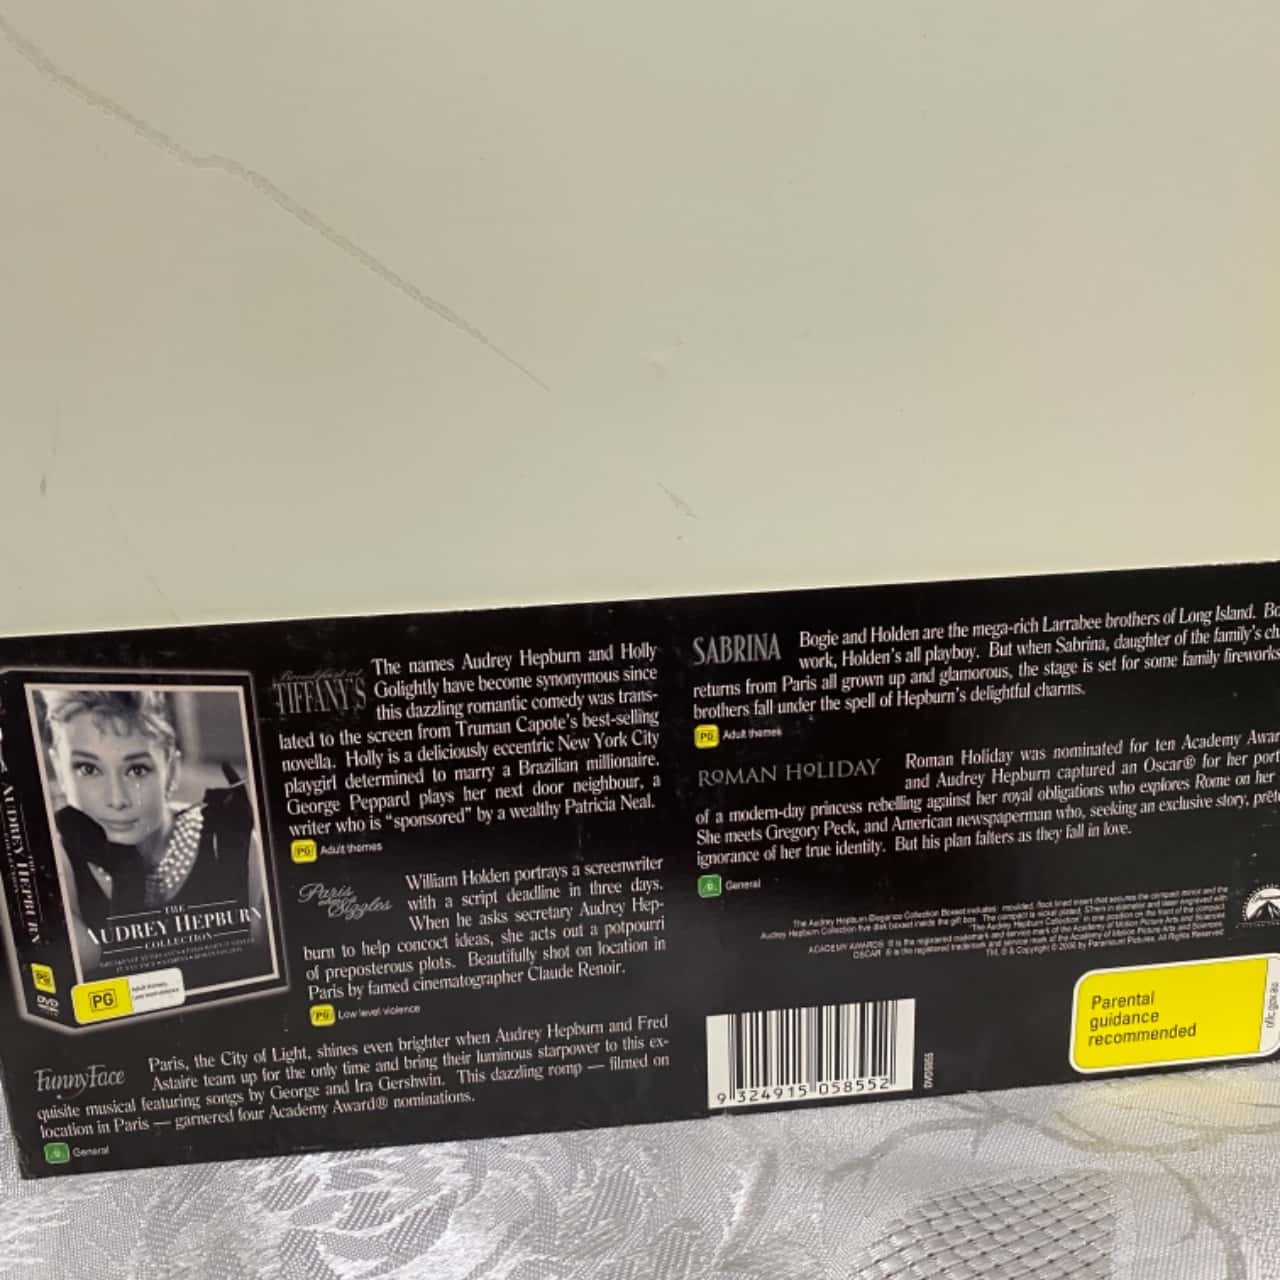 The Audrey Hepburn Collection 5 DVD Set